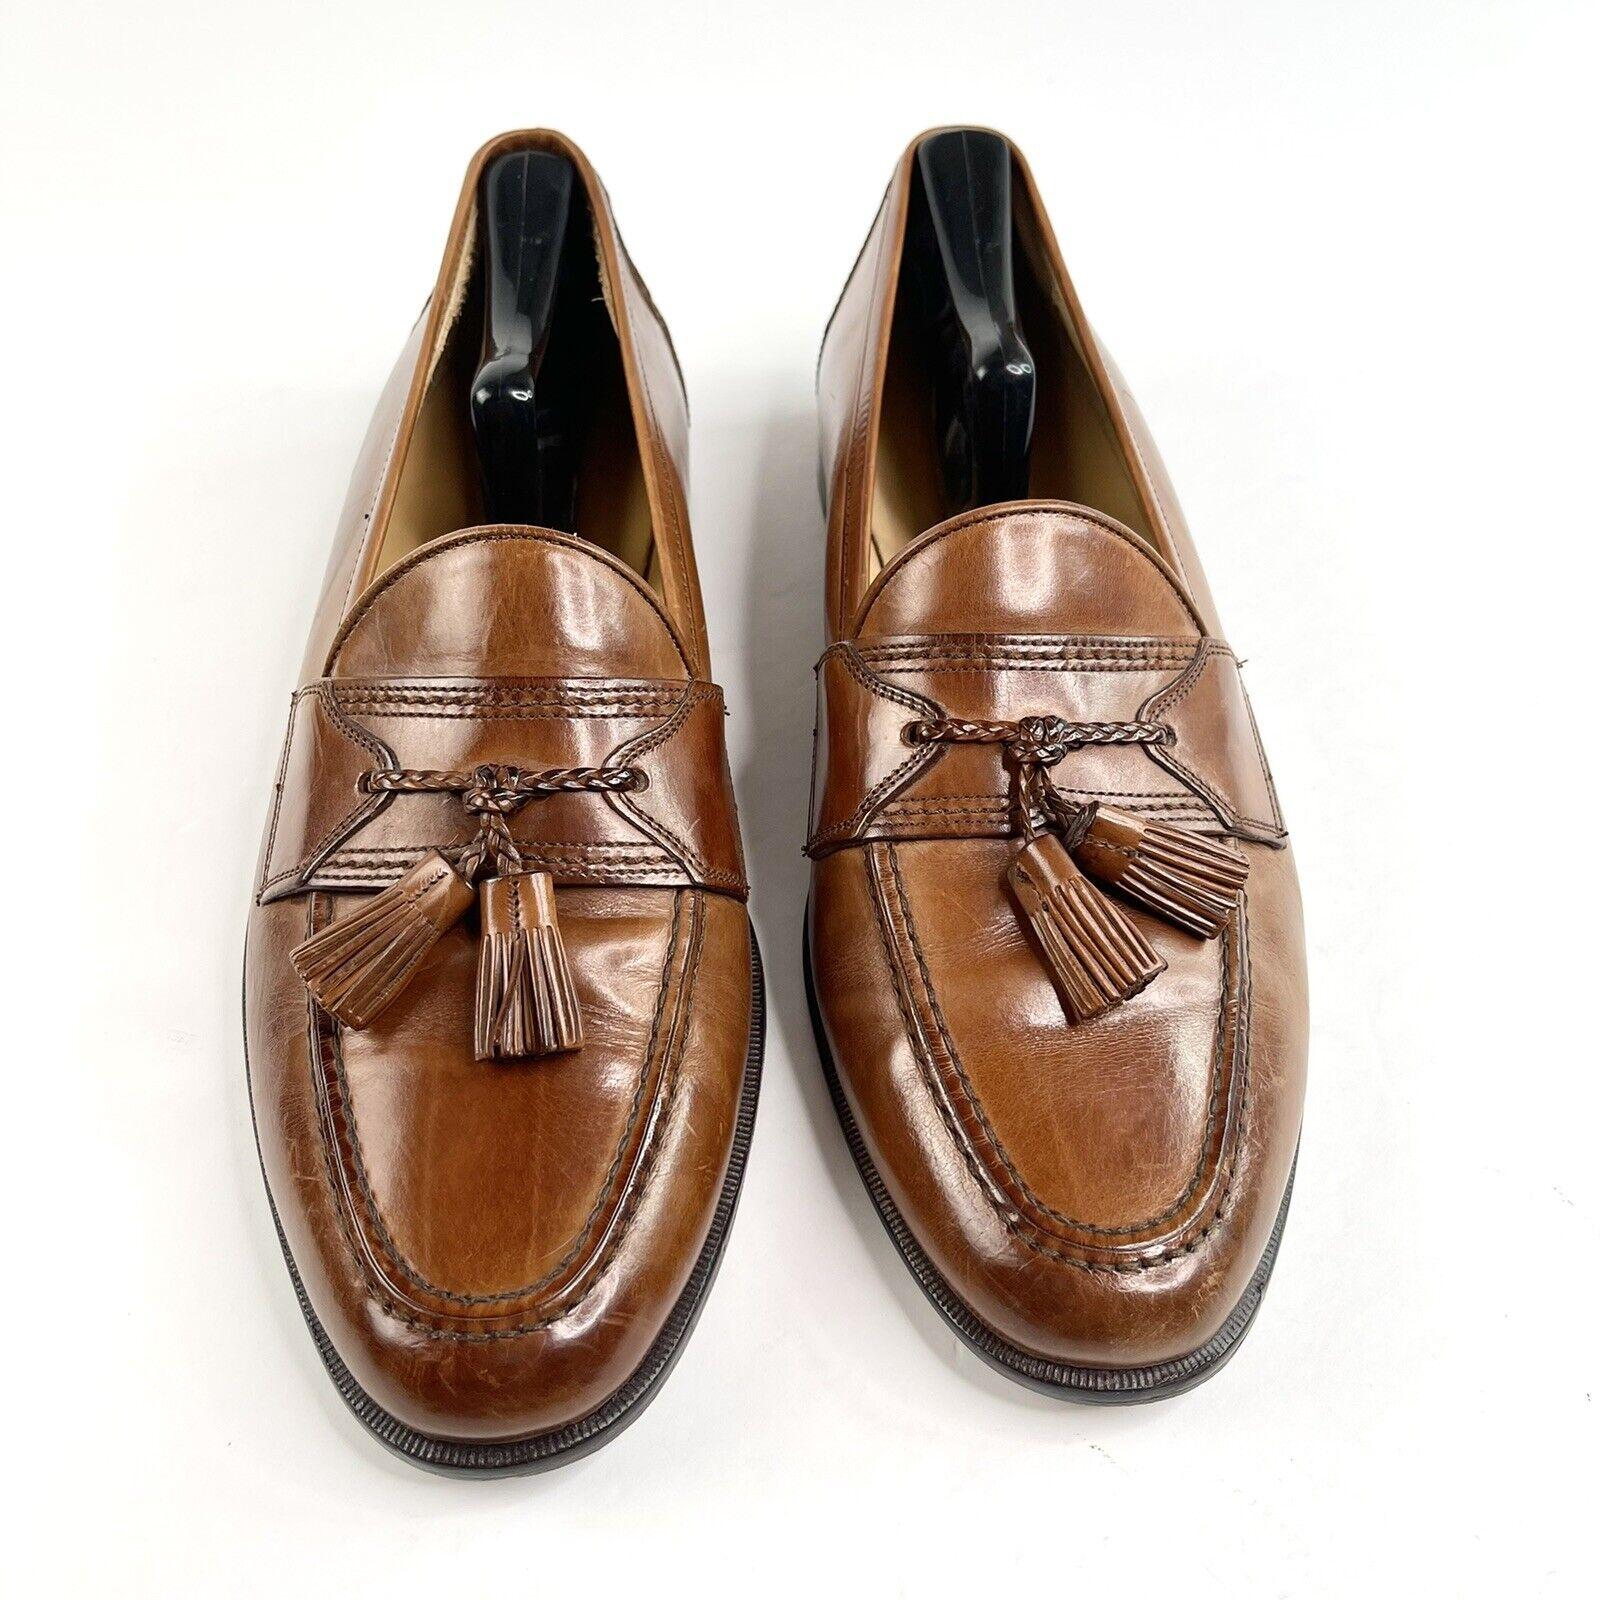 Johnston & Murphy Cellini Slip-On Brown Leather Tassel Italian Loafers 10 M Men